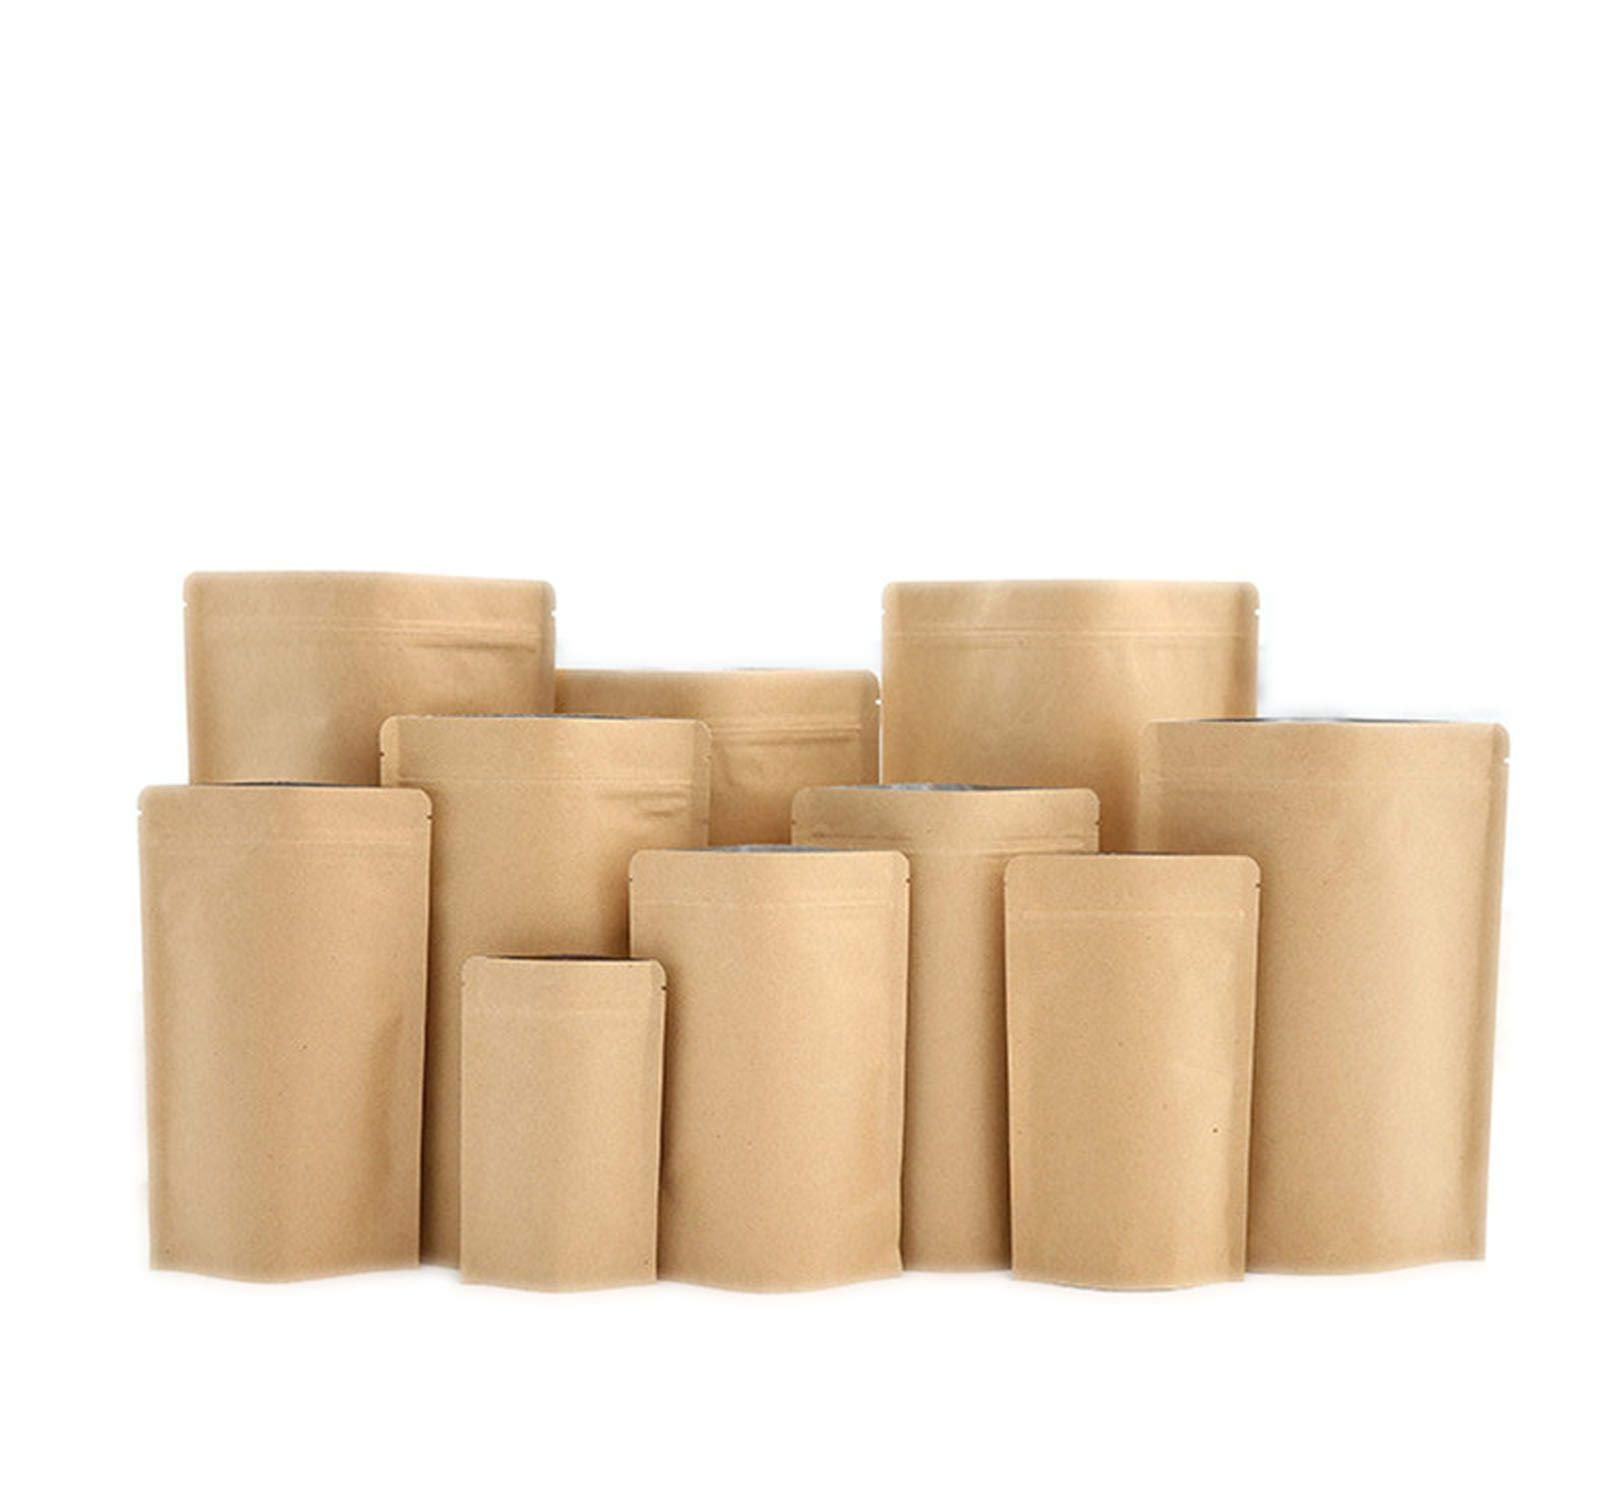 100 Pcs High Barrier Kraft Paper Zipper Coffee Pouch Bag Zip Lock Food Gift Cookie Baking Packaging Paper Bags,20x30cm